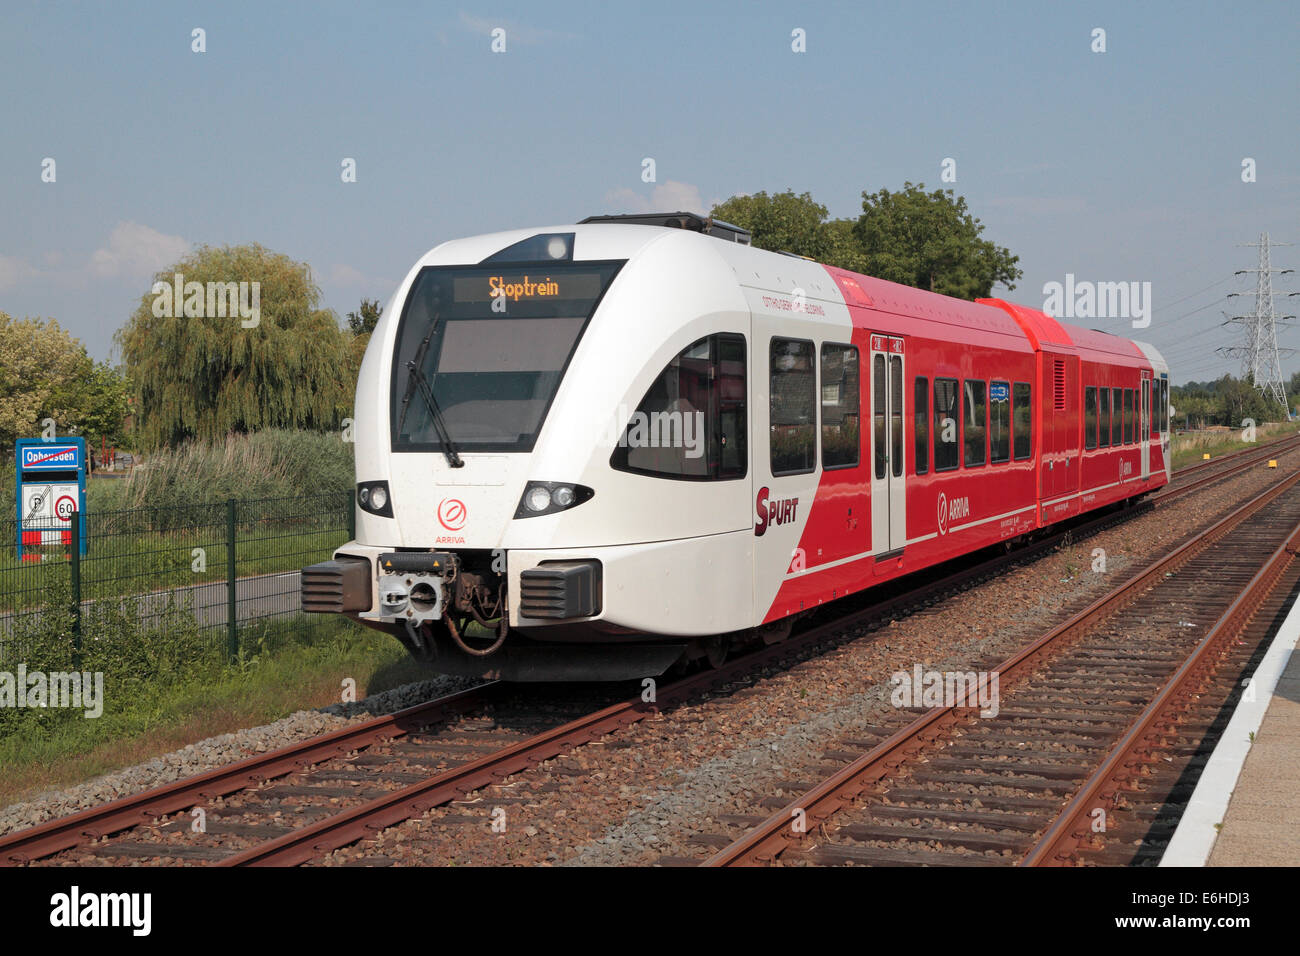 An Arriva Netherlands 'Spurt' train passing at Opheusden station, Gelderland, Netherlands. - Stock Image